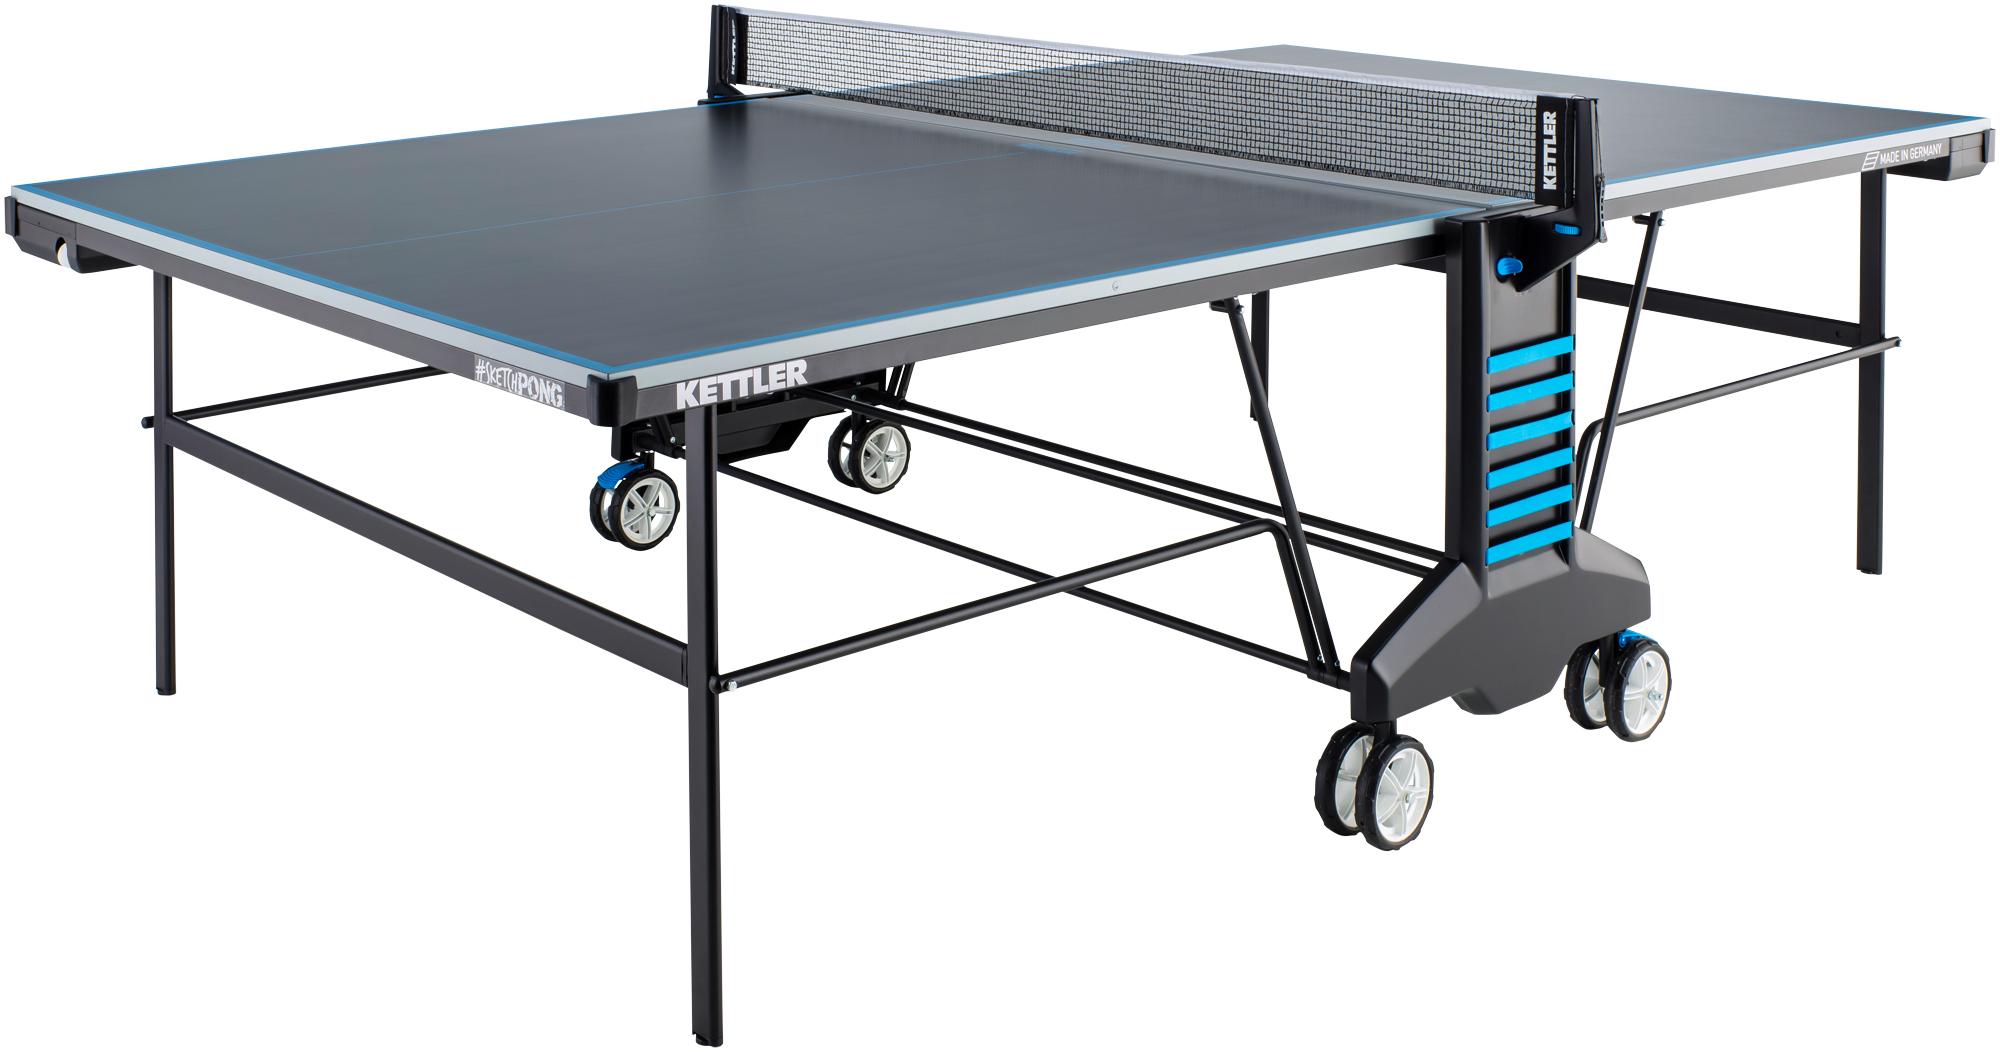 Kettler Теннисный стол Kettler Sketch & Pong Outdoor